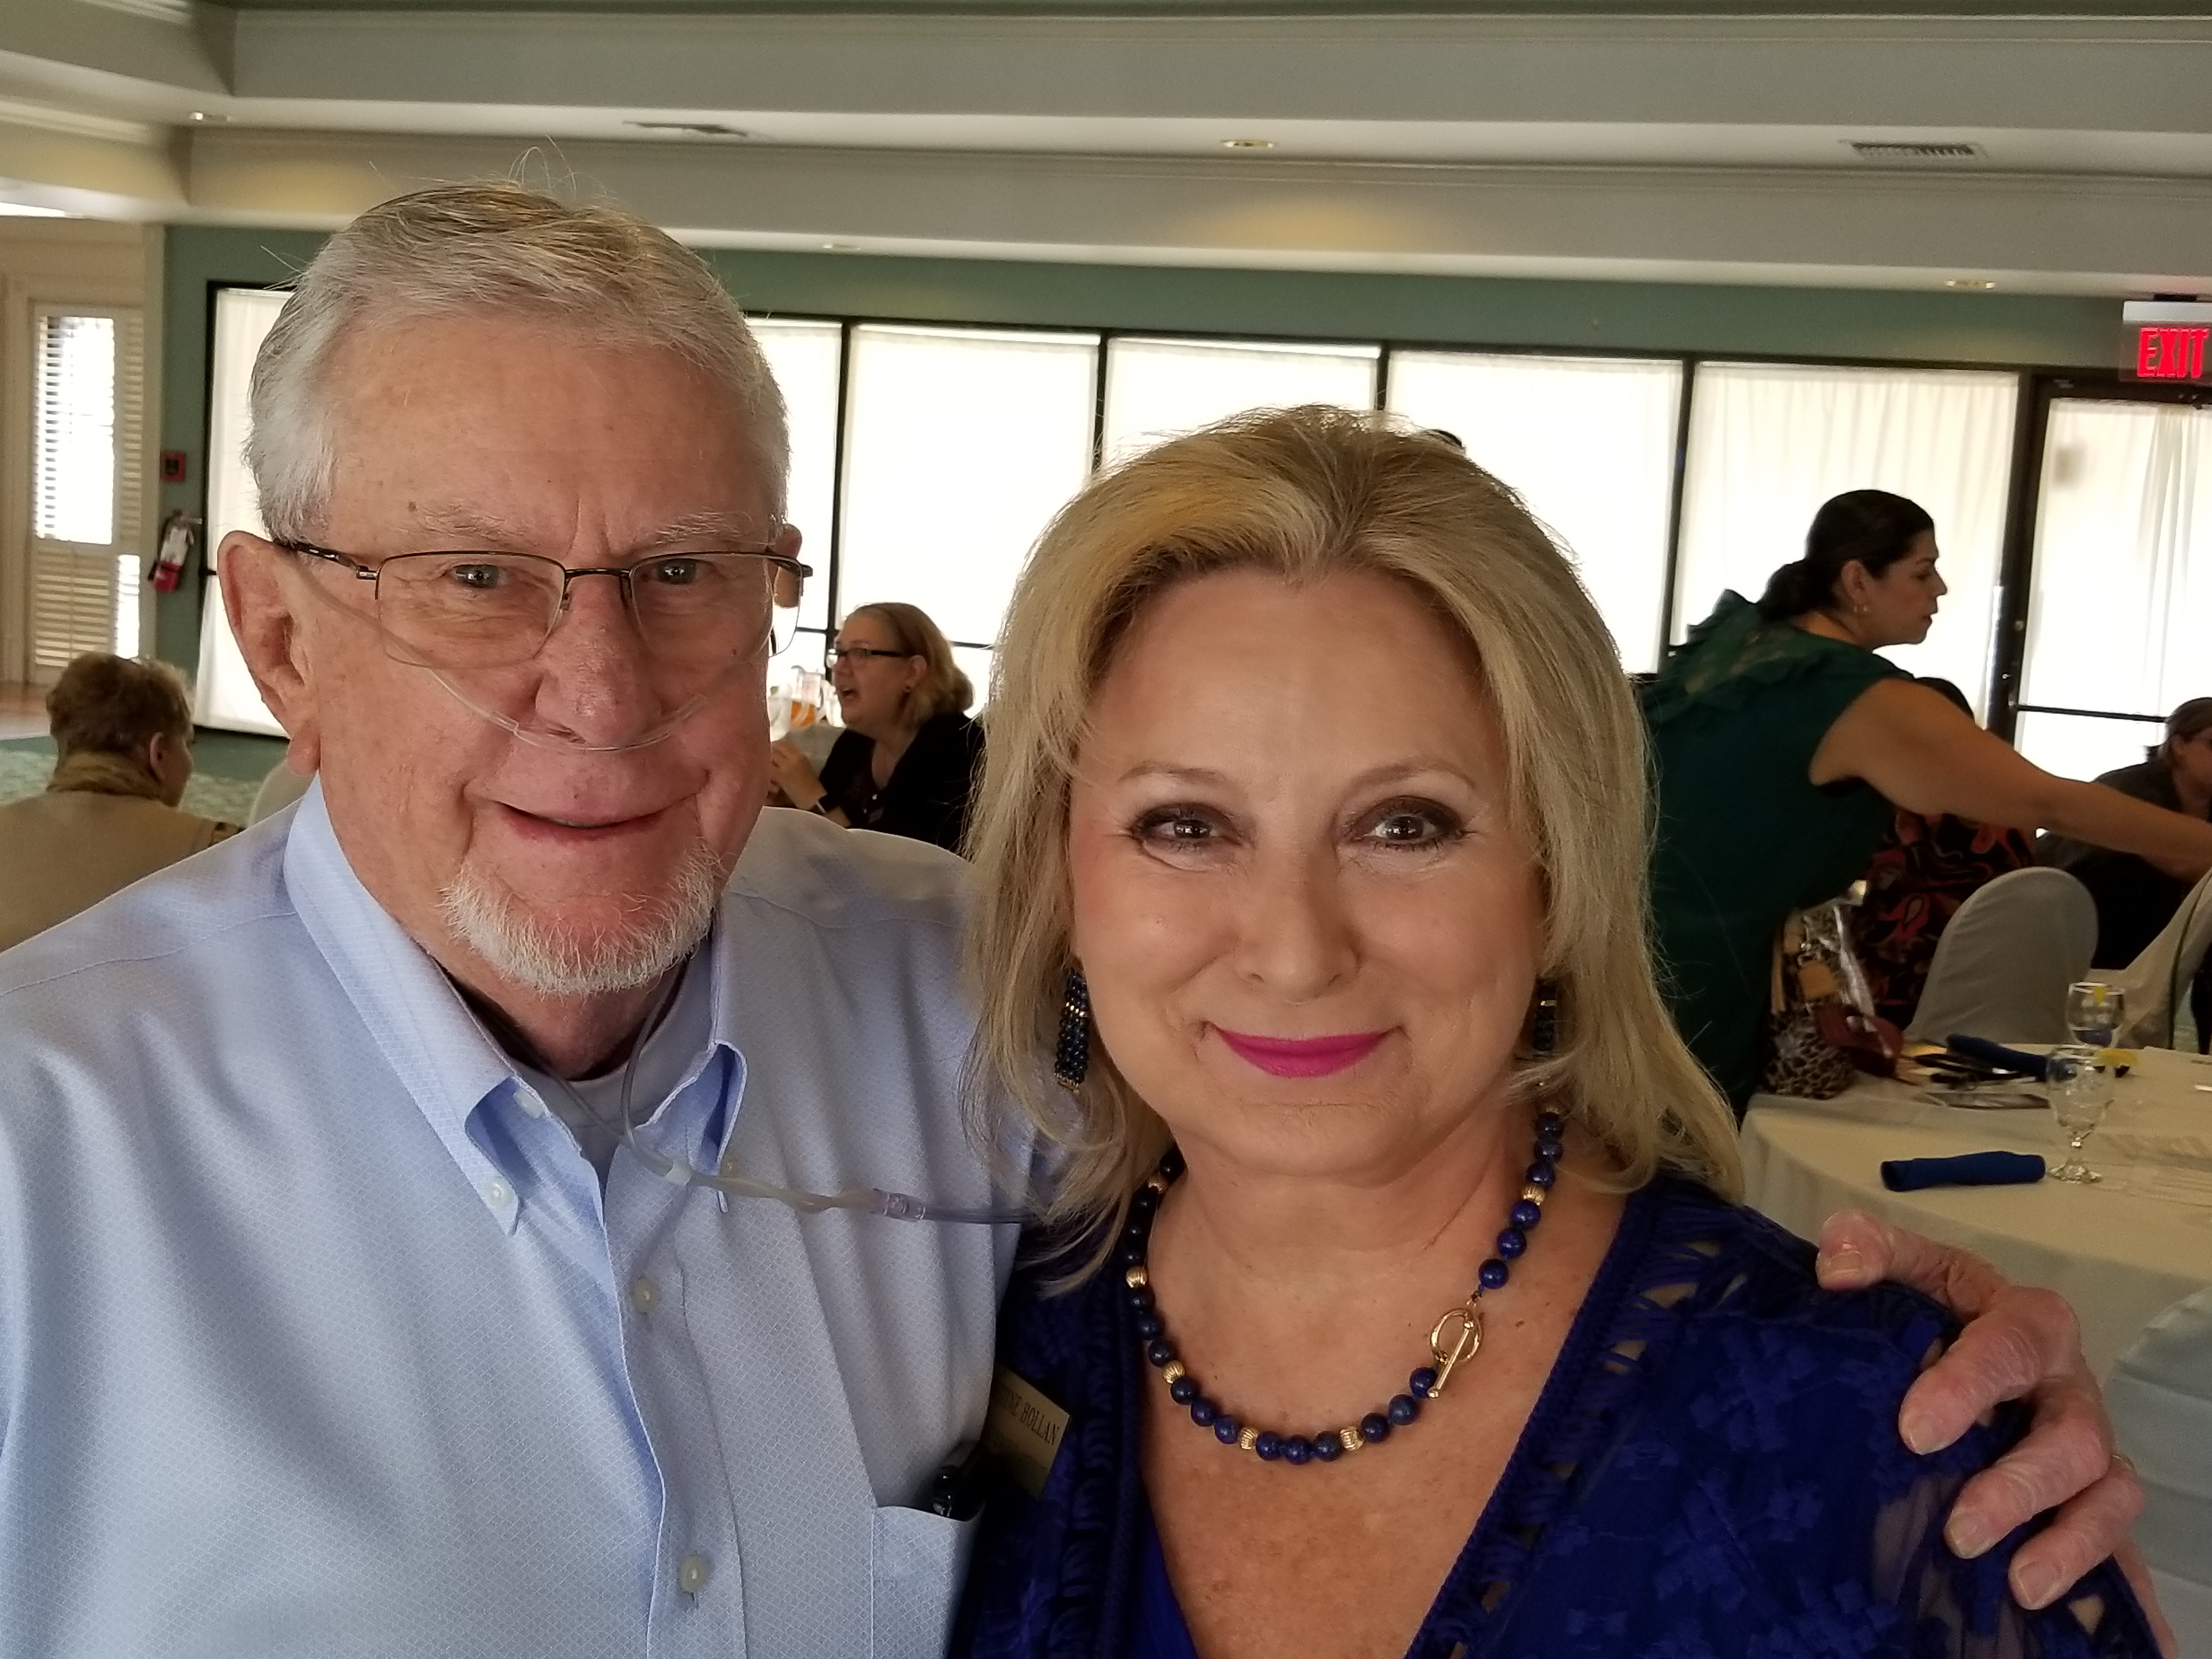 Jim and Christine